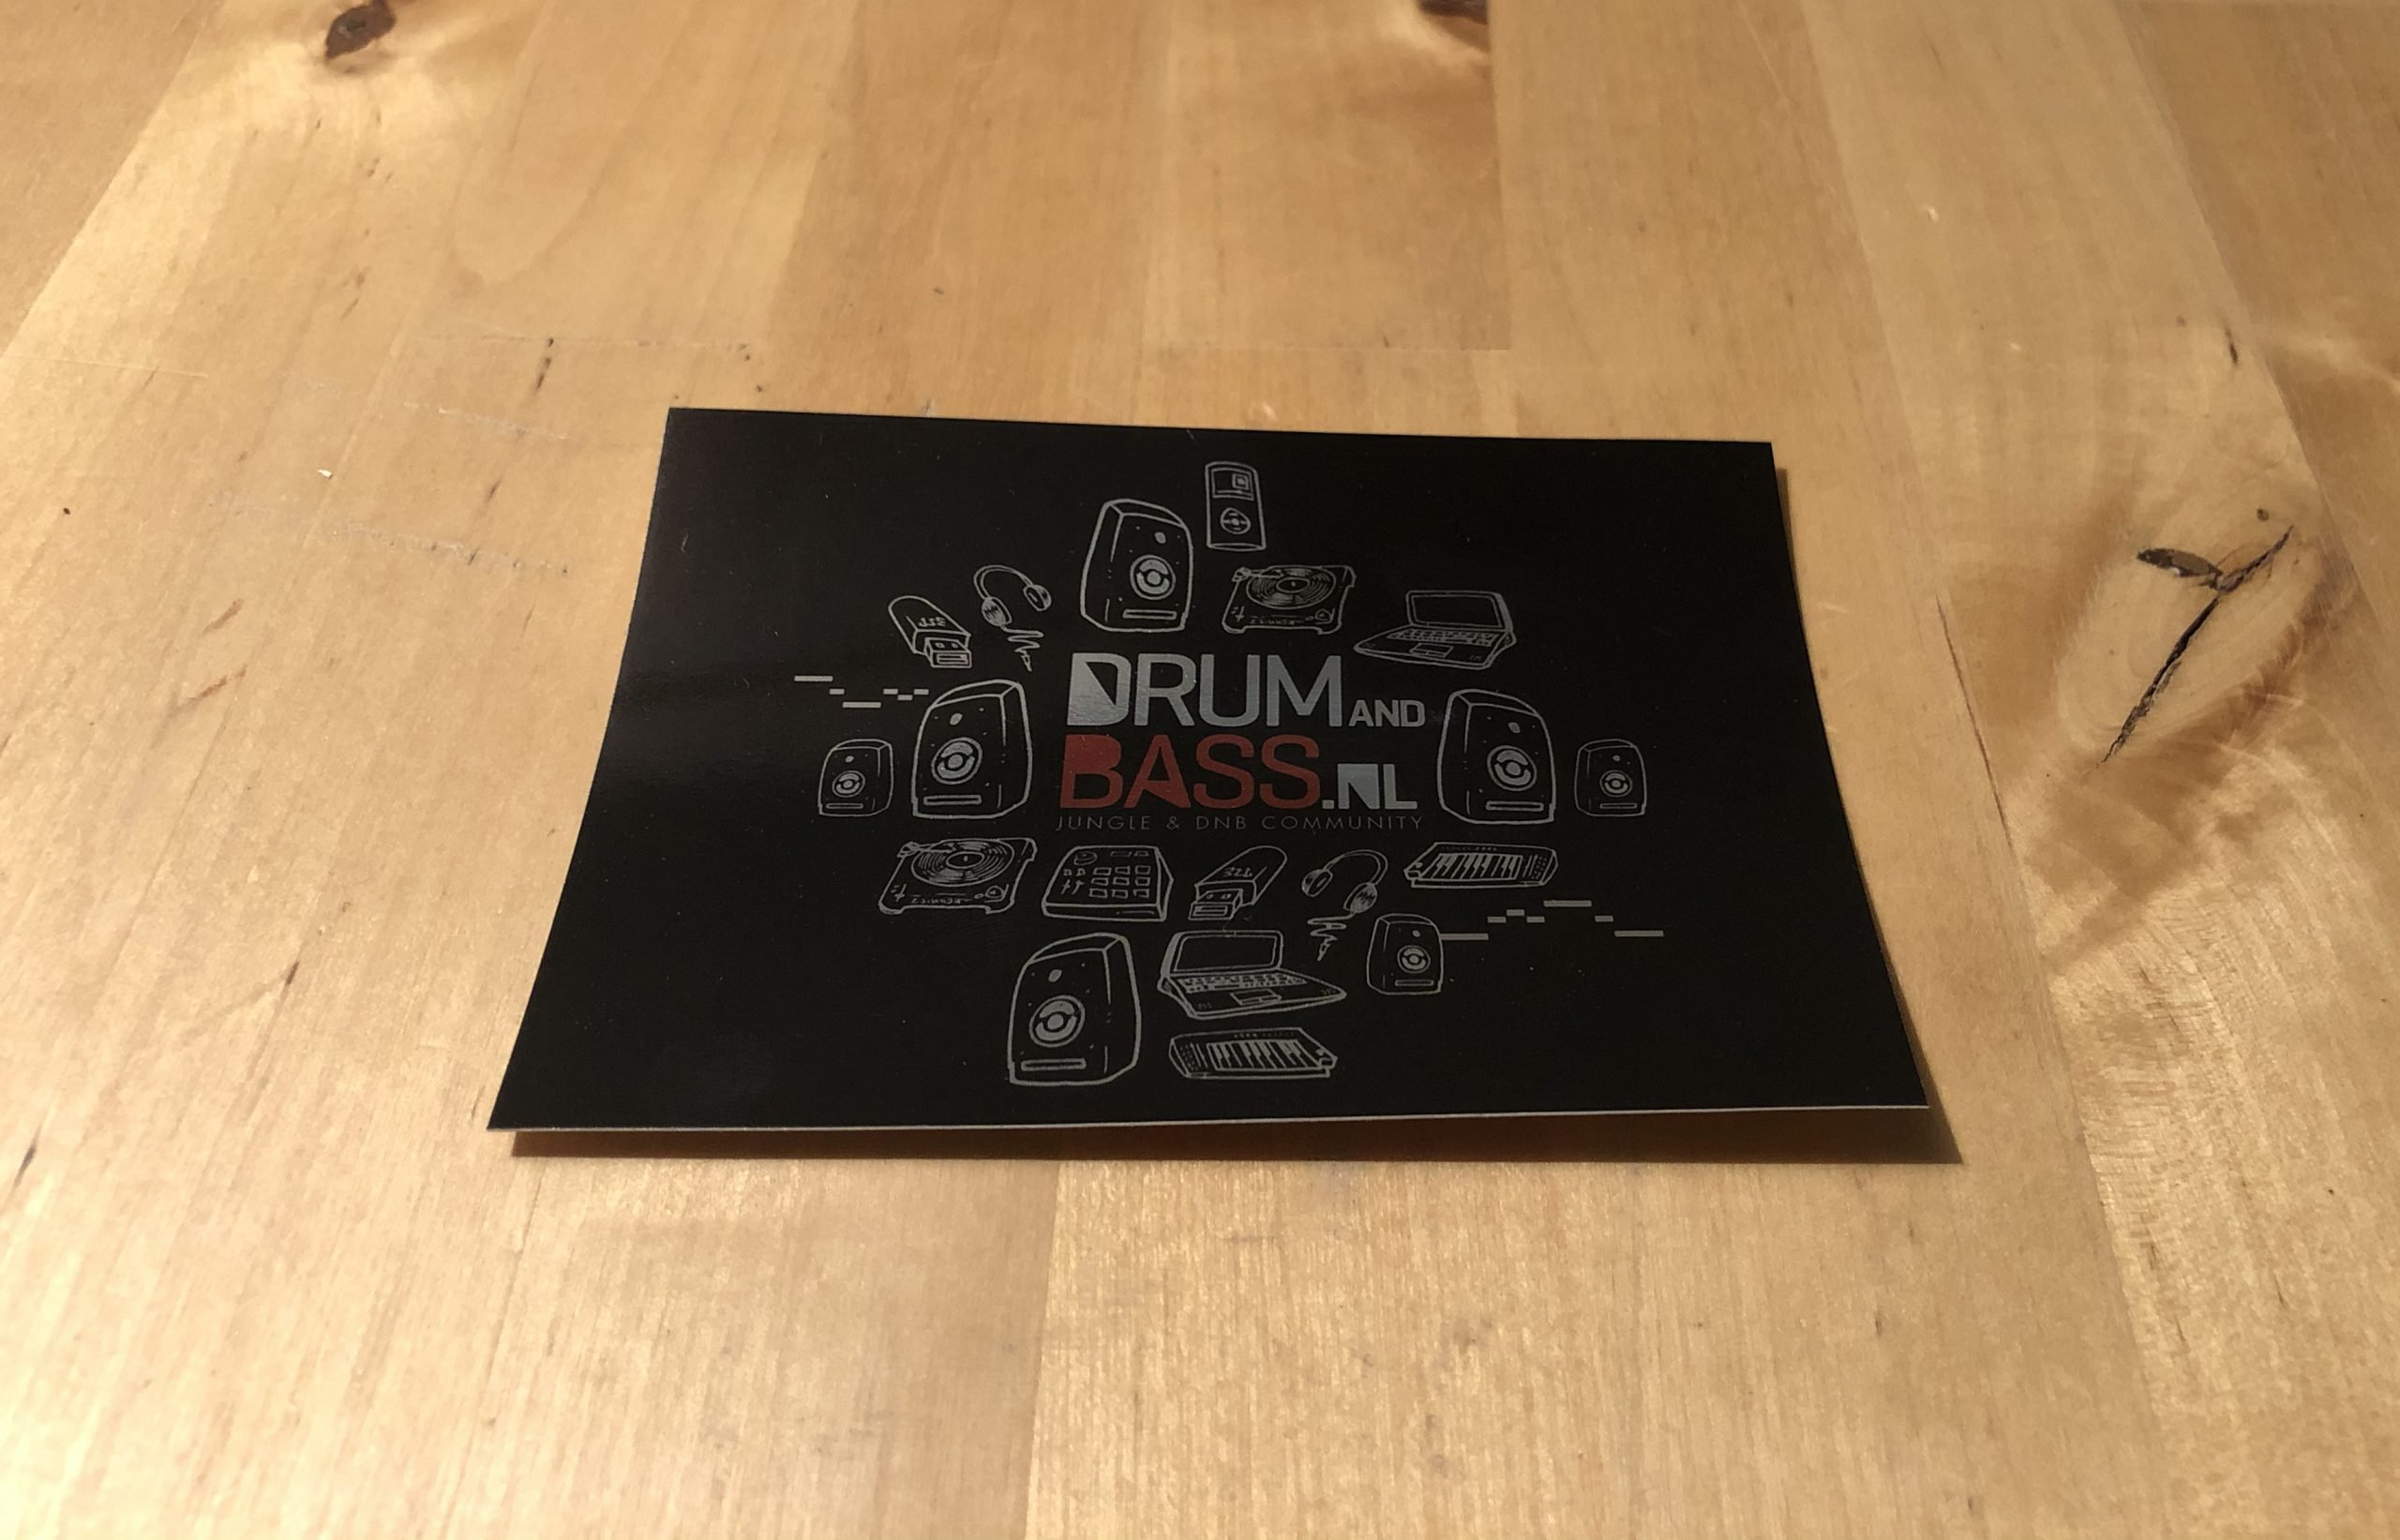 DrumandBass.nl Stickers